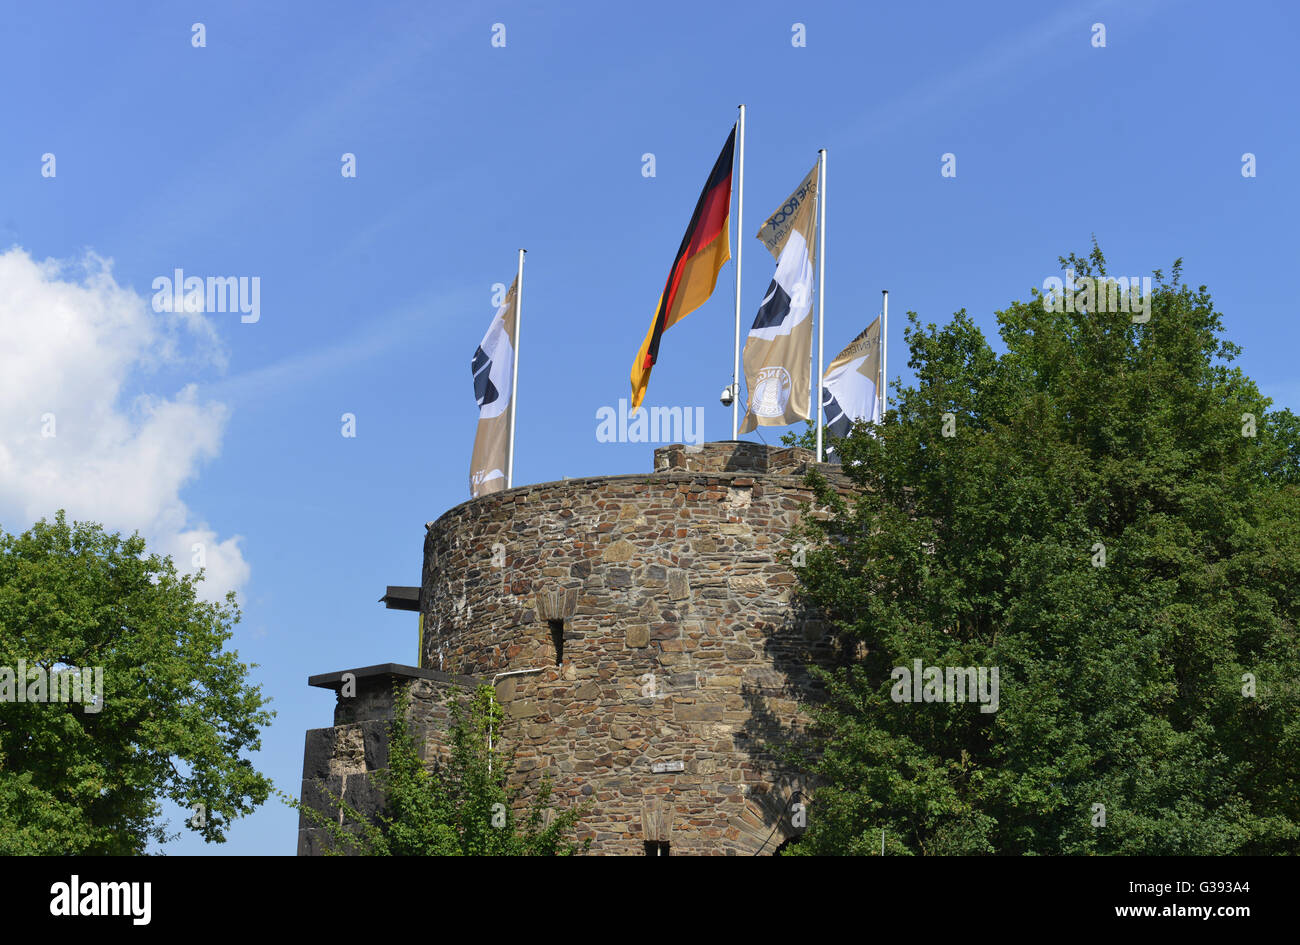 Castle, Loreley, Sankt Goarshausen, Rhineland-Palatinate, Germany Stock Photo